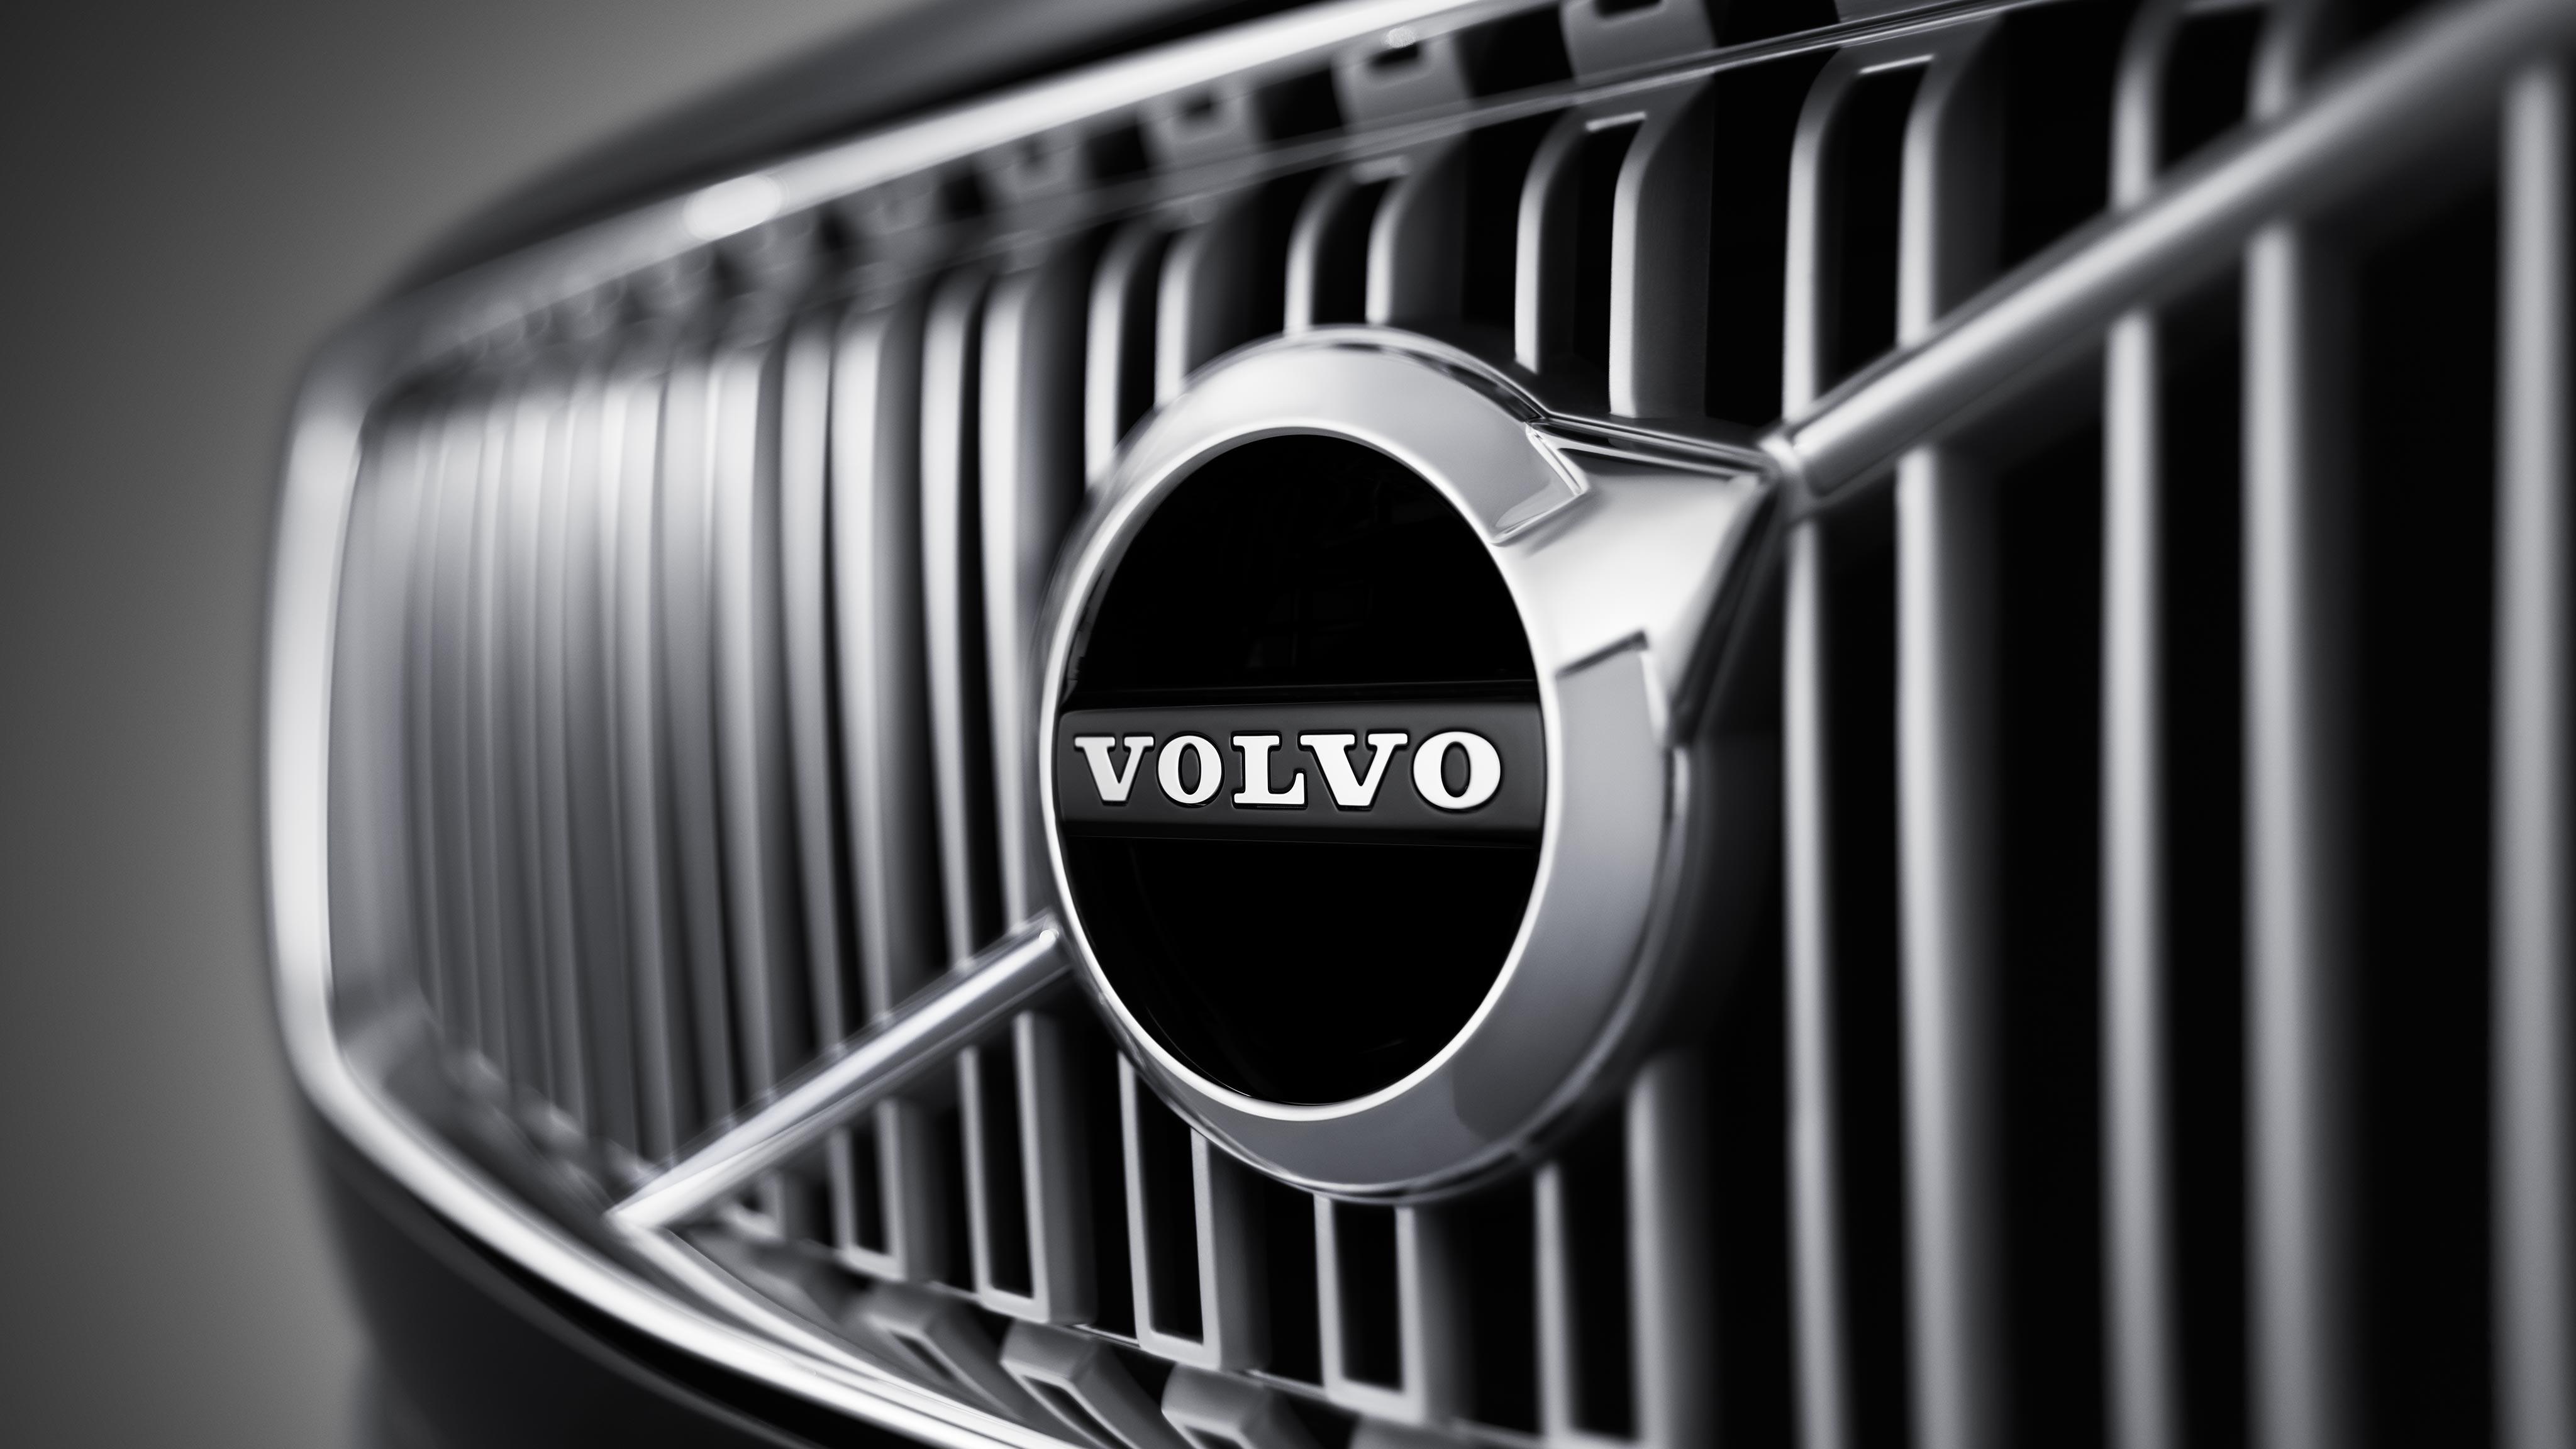 md dealership annapolis inventory polestar america parts cars north volvo